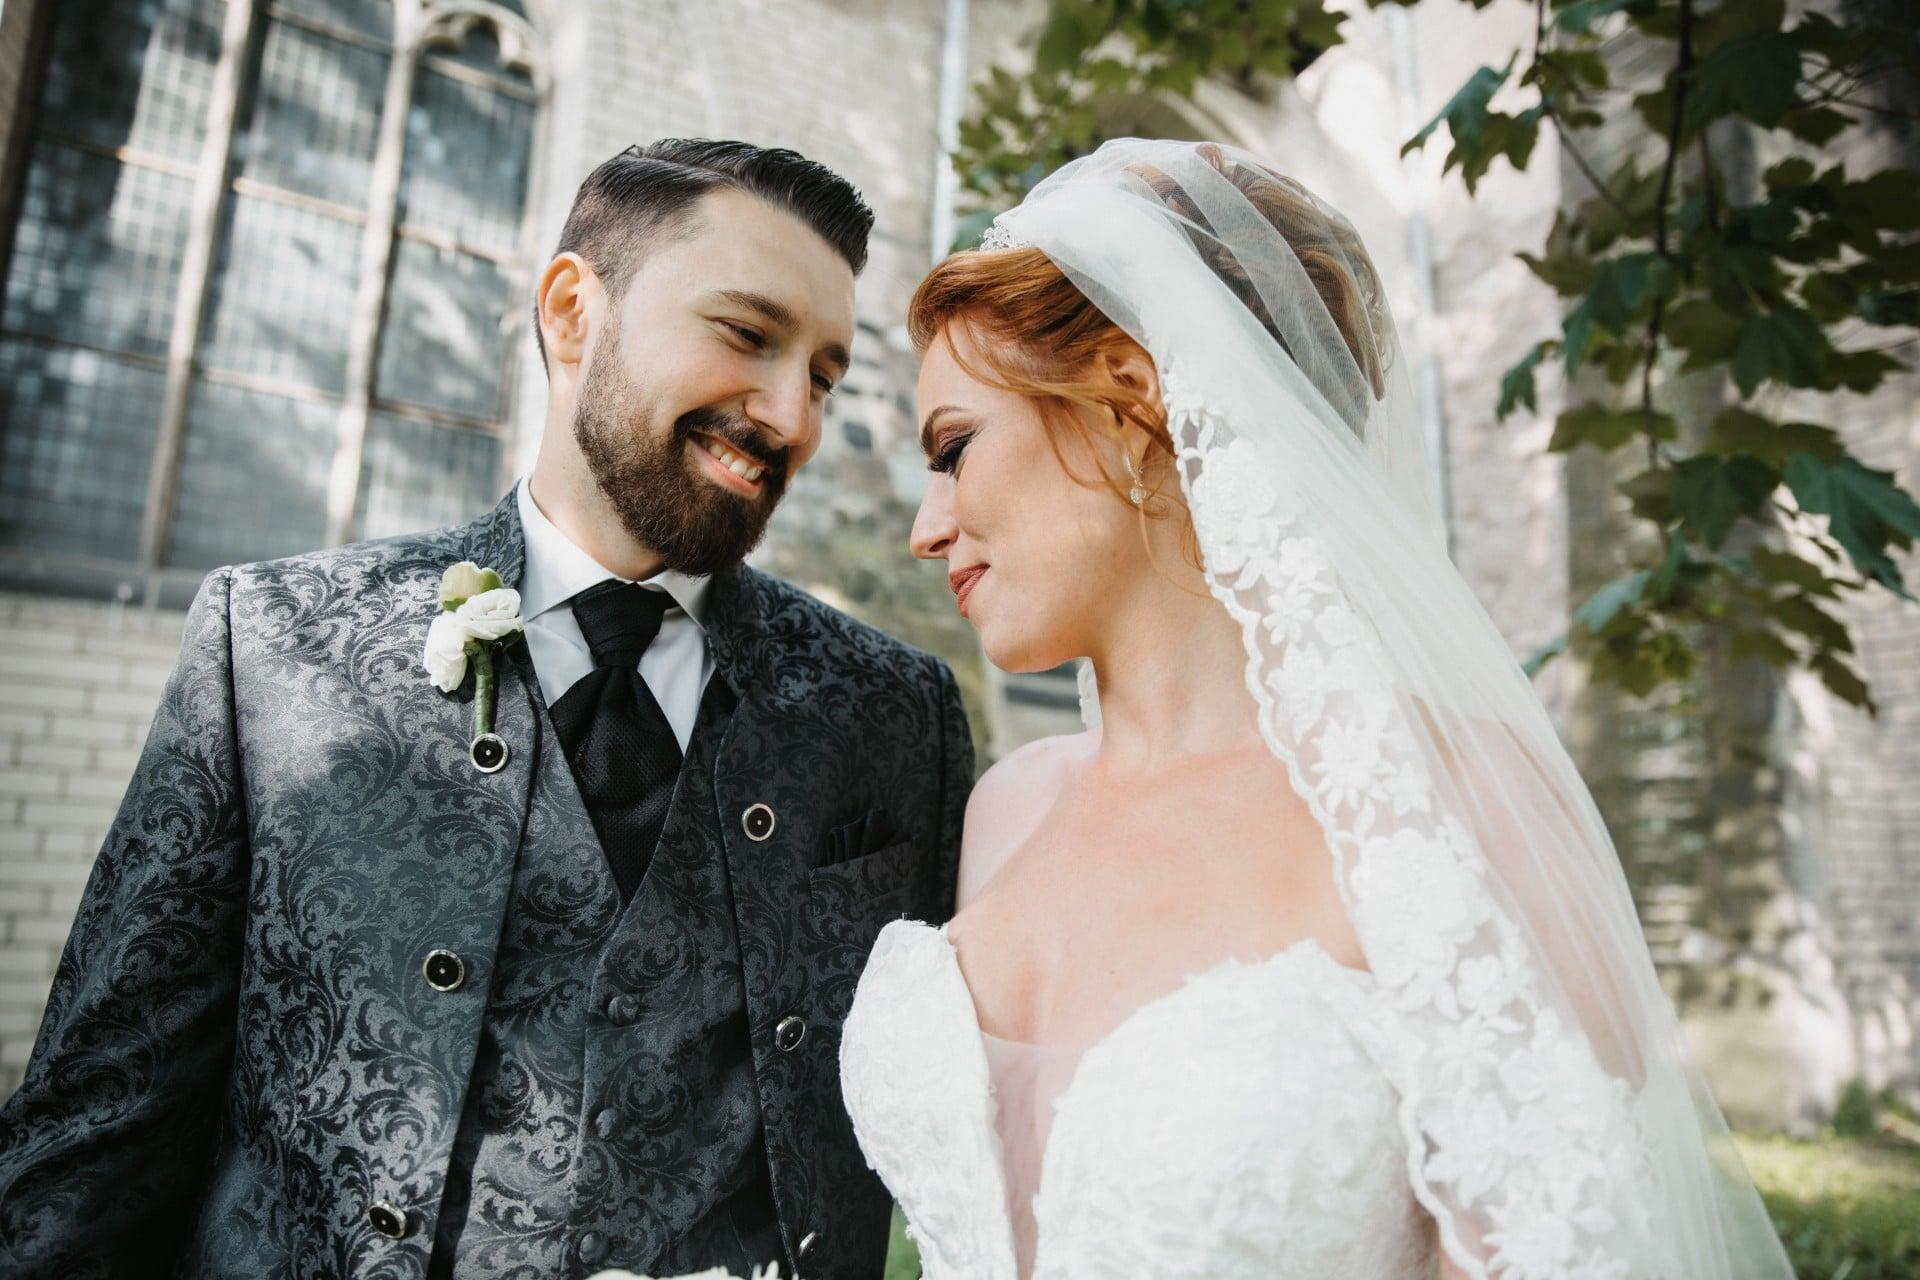 133-Tania-Flores-Photography-Hochzeitsfotos-HVSPnv4C